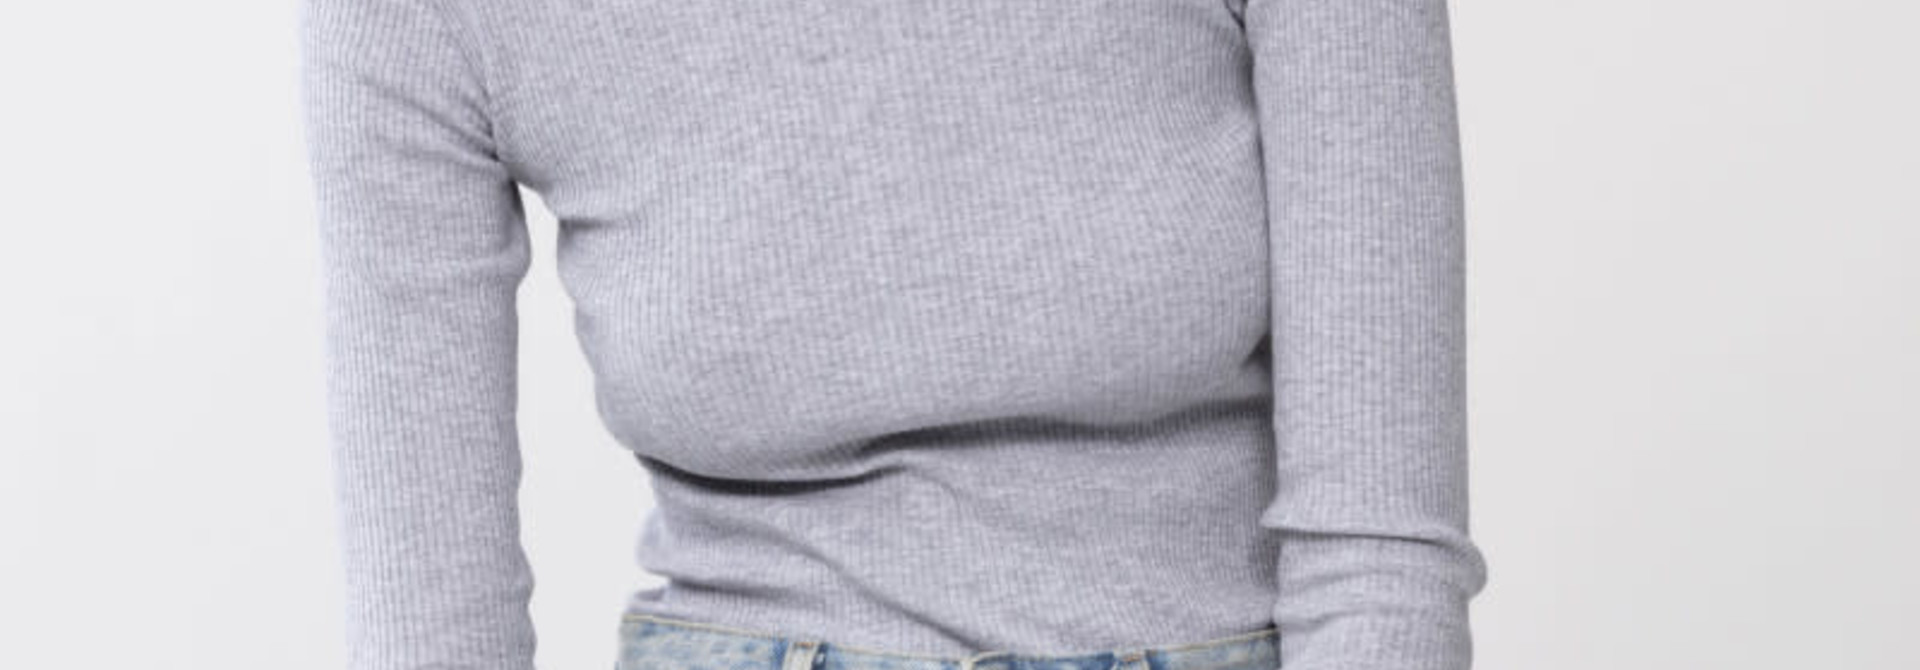 T-shirt lange mouw Cotton Rib 26516 - grijs